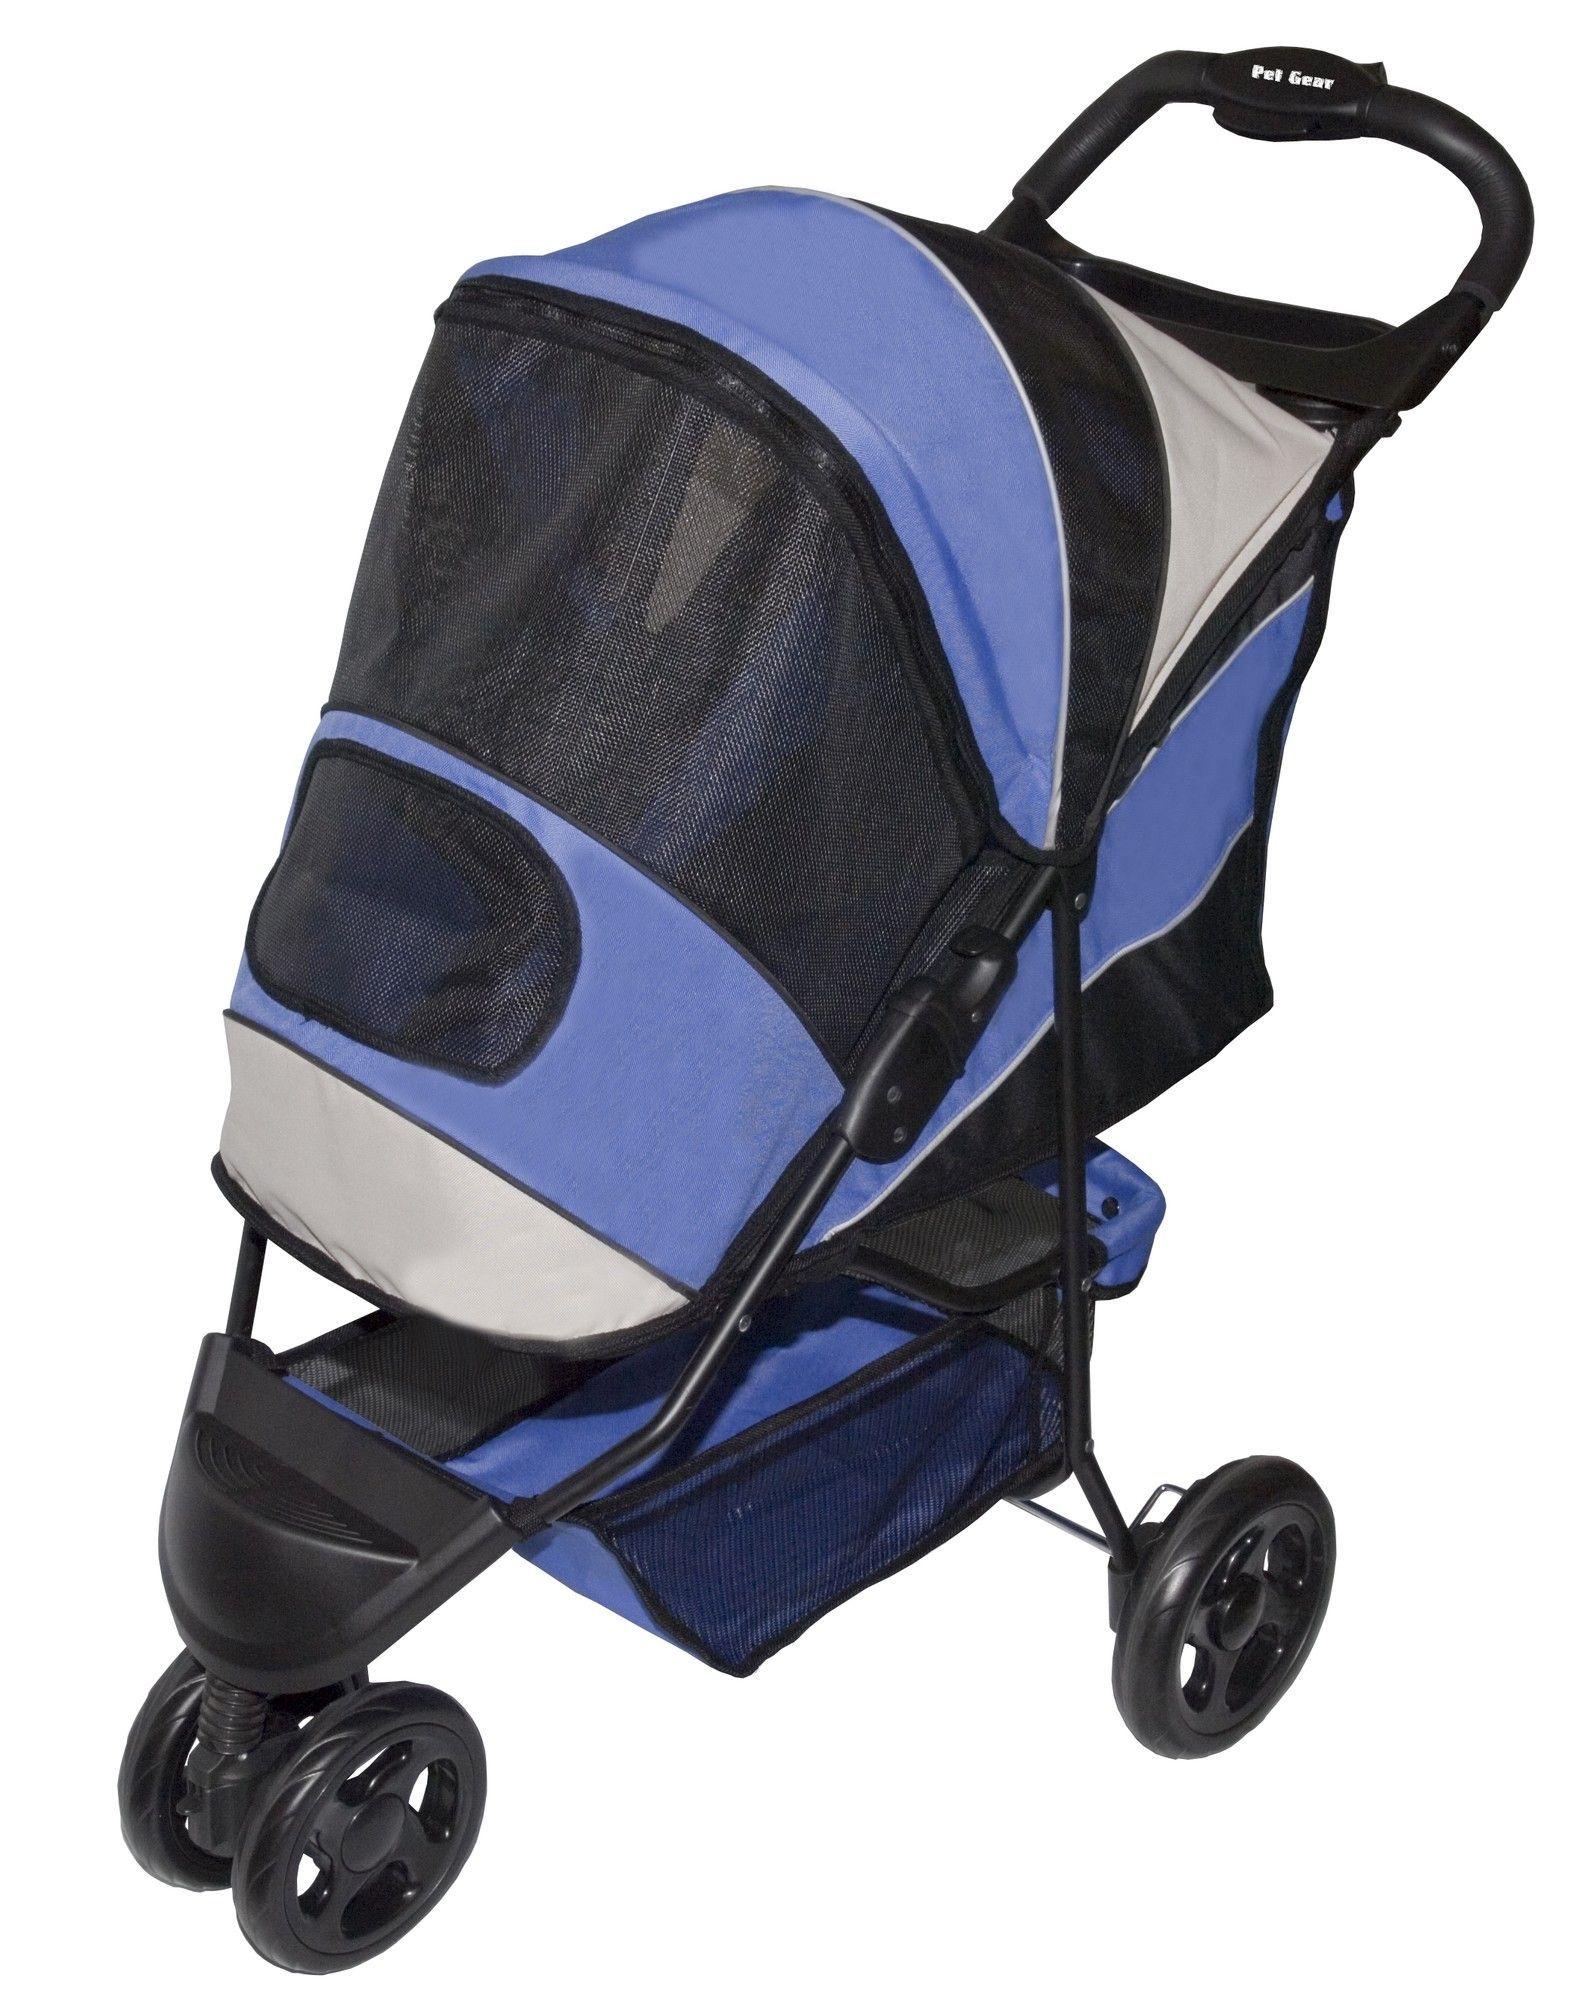 Sportster Pet Stroller Pet stroller, Dog stroller, Pet gear